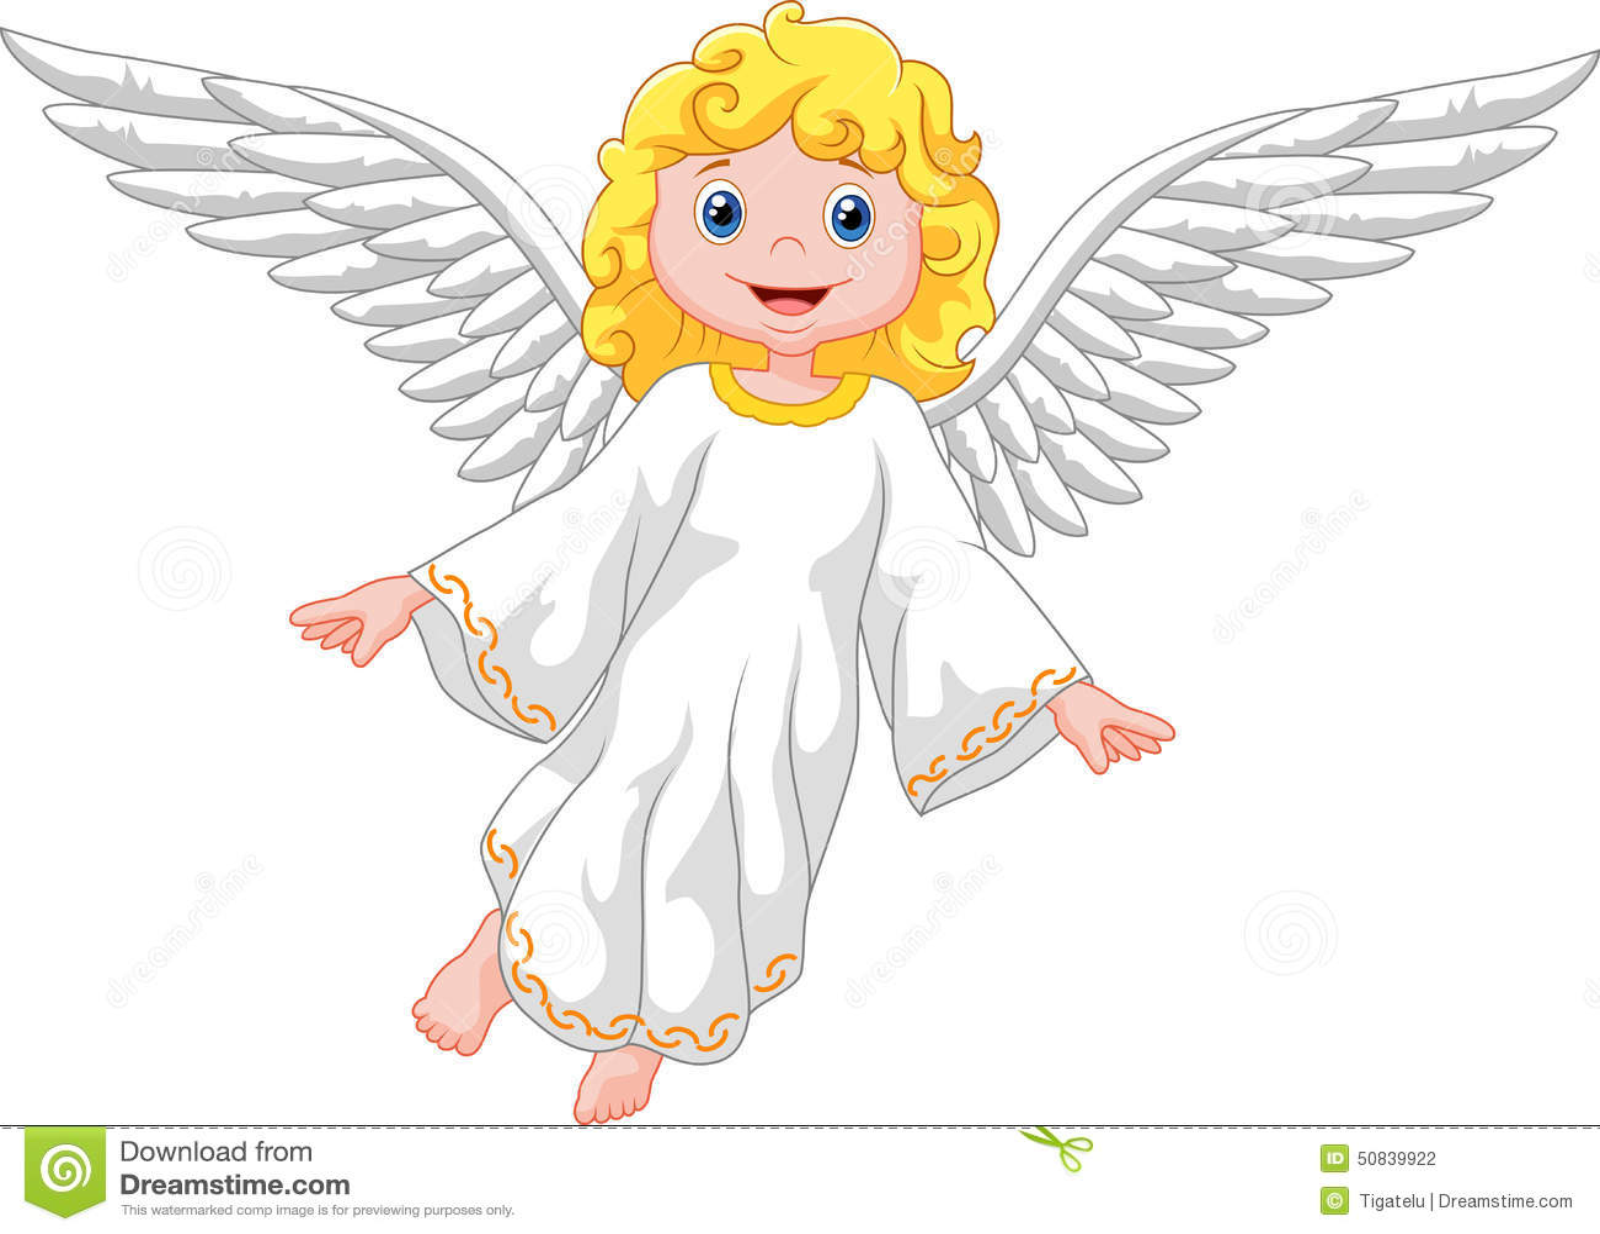 cute cartoon angel stock vector image 50839922 congratulations clipart free animated congratulations clipart free animated